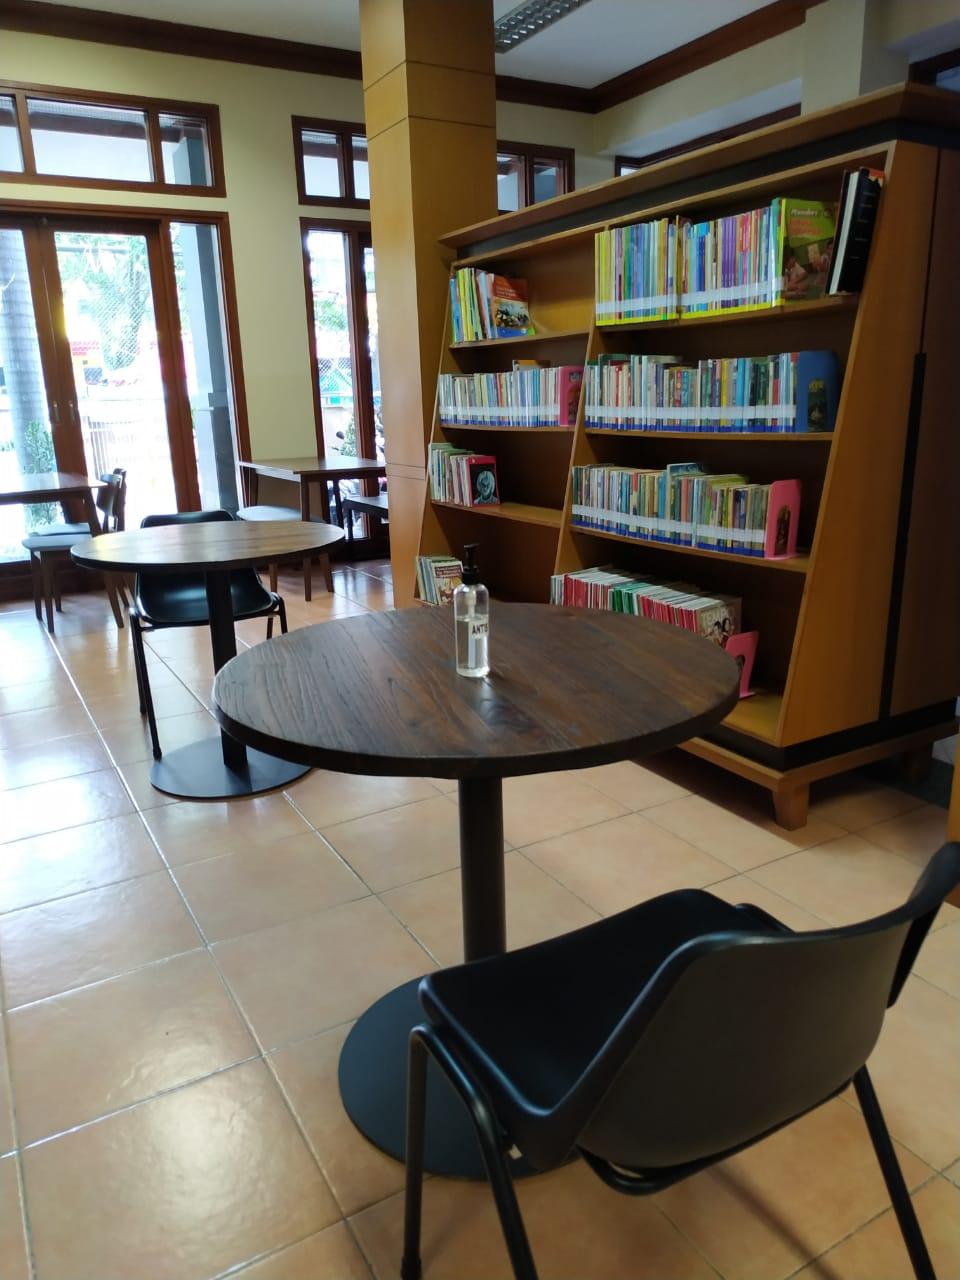 Foto ruang dalam perpustakaan